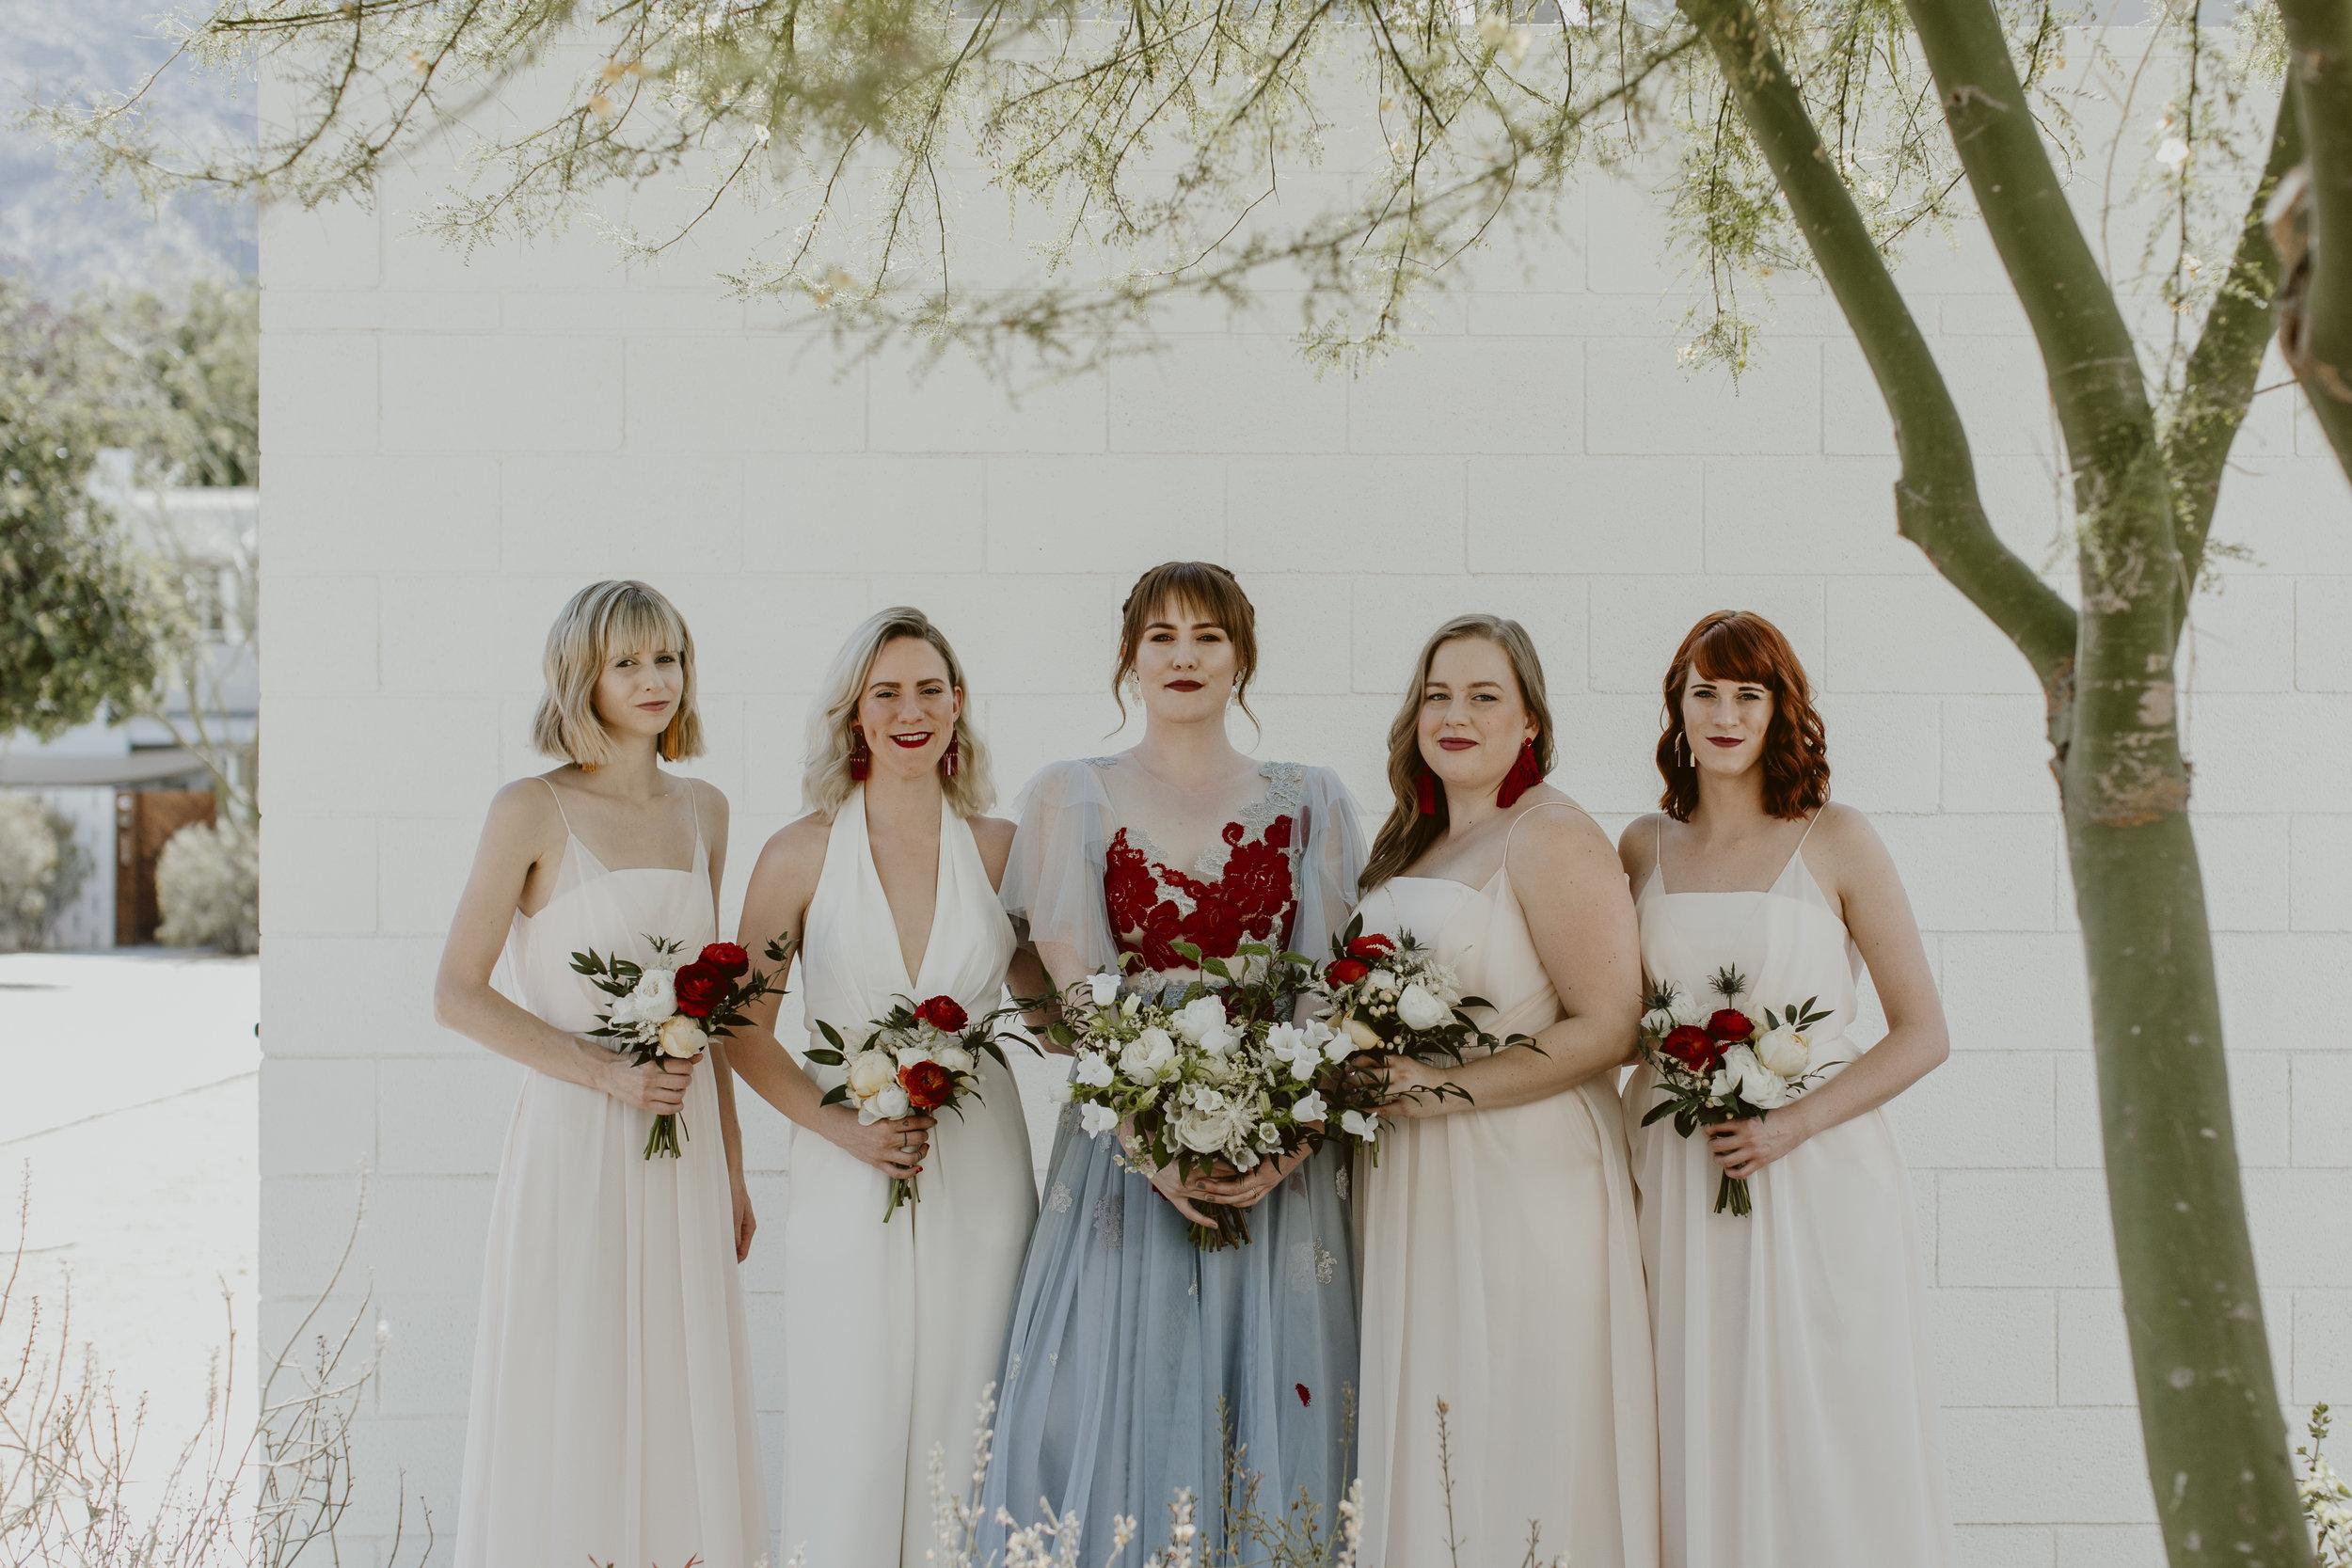 2018 05-12 Testa-Lecher Wedding 00174.jpg